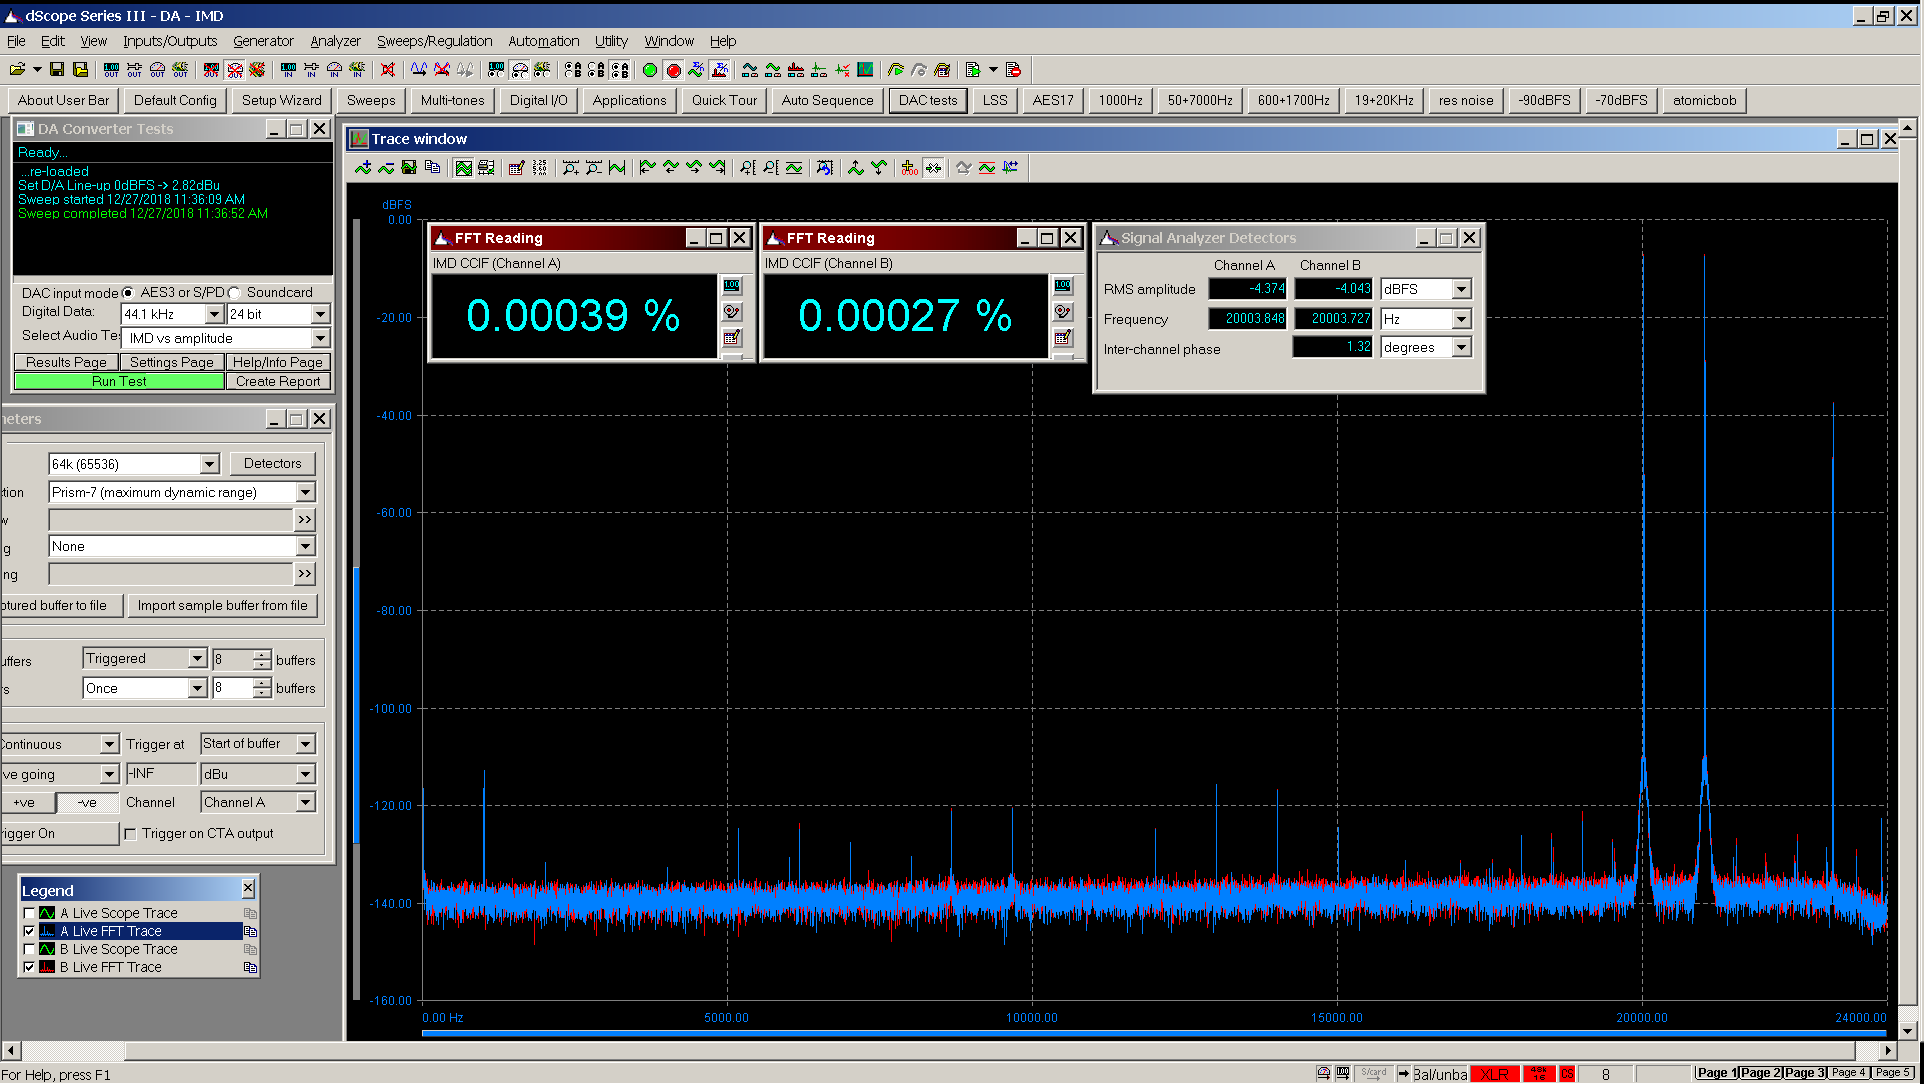 20181227-04 convert2 Bal IMD spectrum - AES.PNG